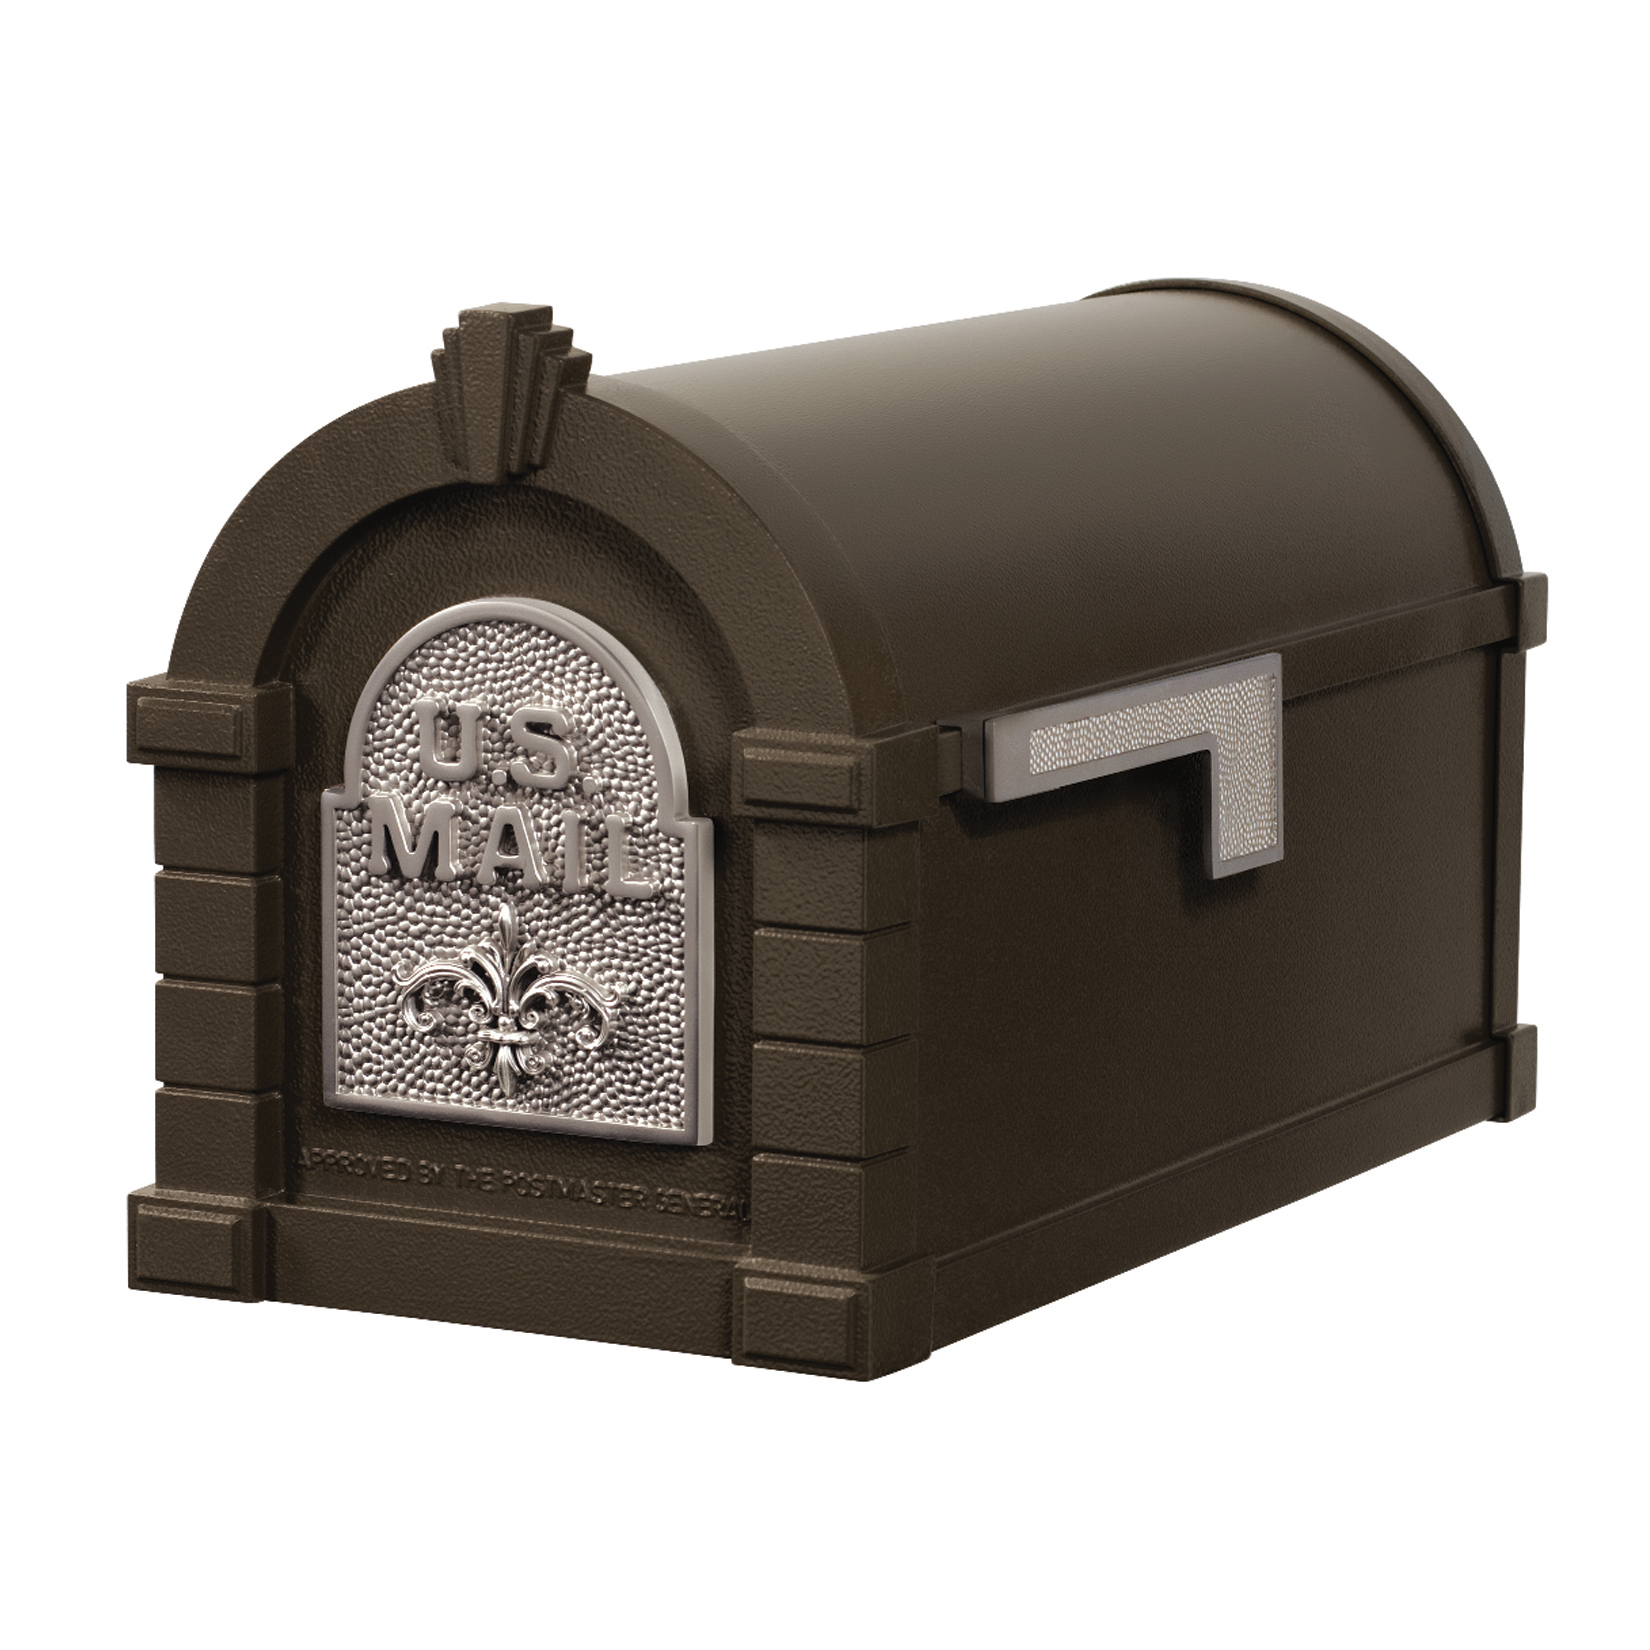 Gaines Fleur De Lis Keystone Mailboxes - Bronze with Satin Nickel